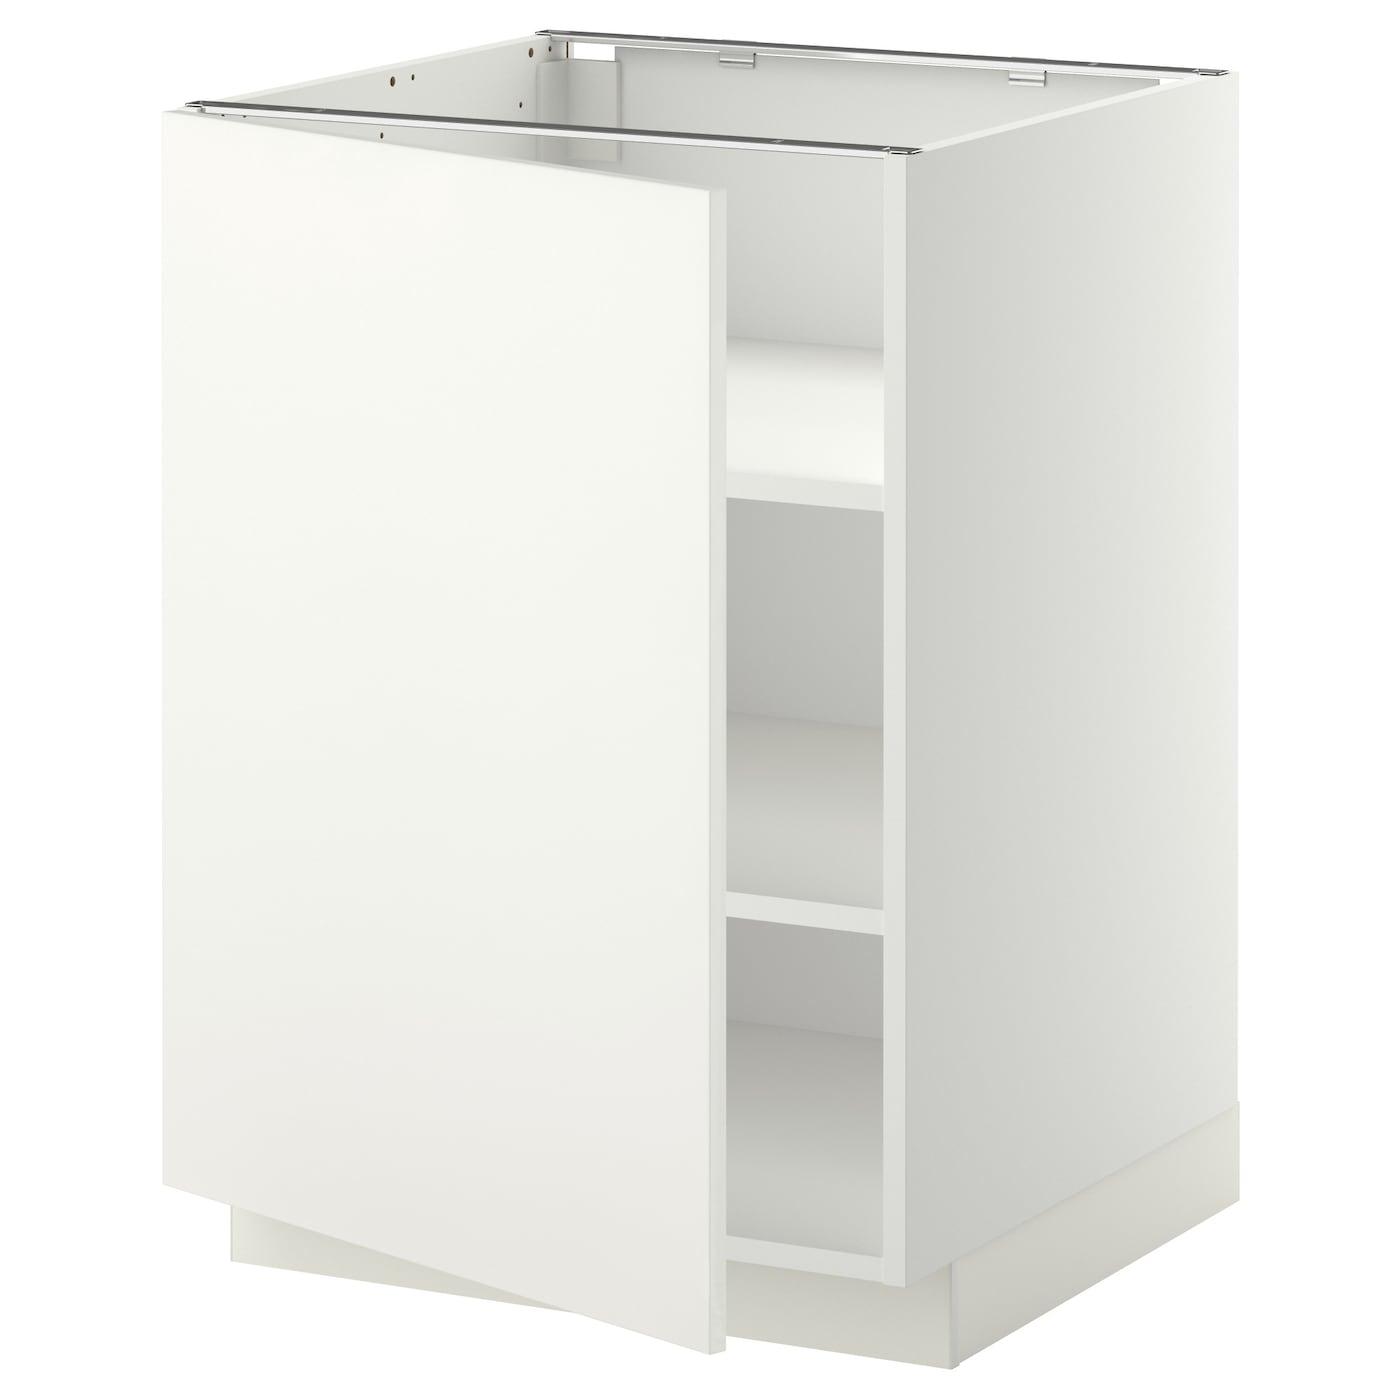 Metod armario bajo cocina con baldas blanco h ggeby blanco - Ikea baldas cocina ...